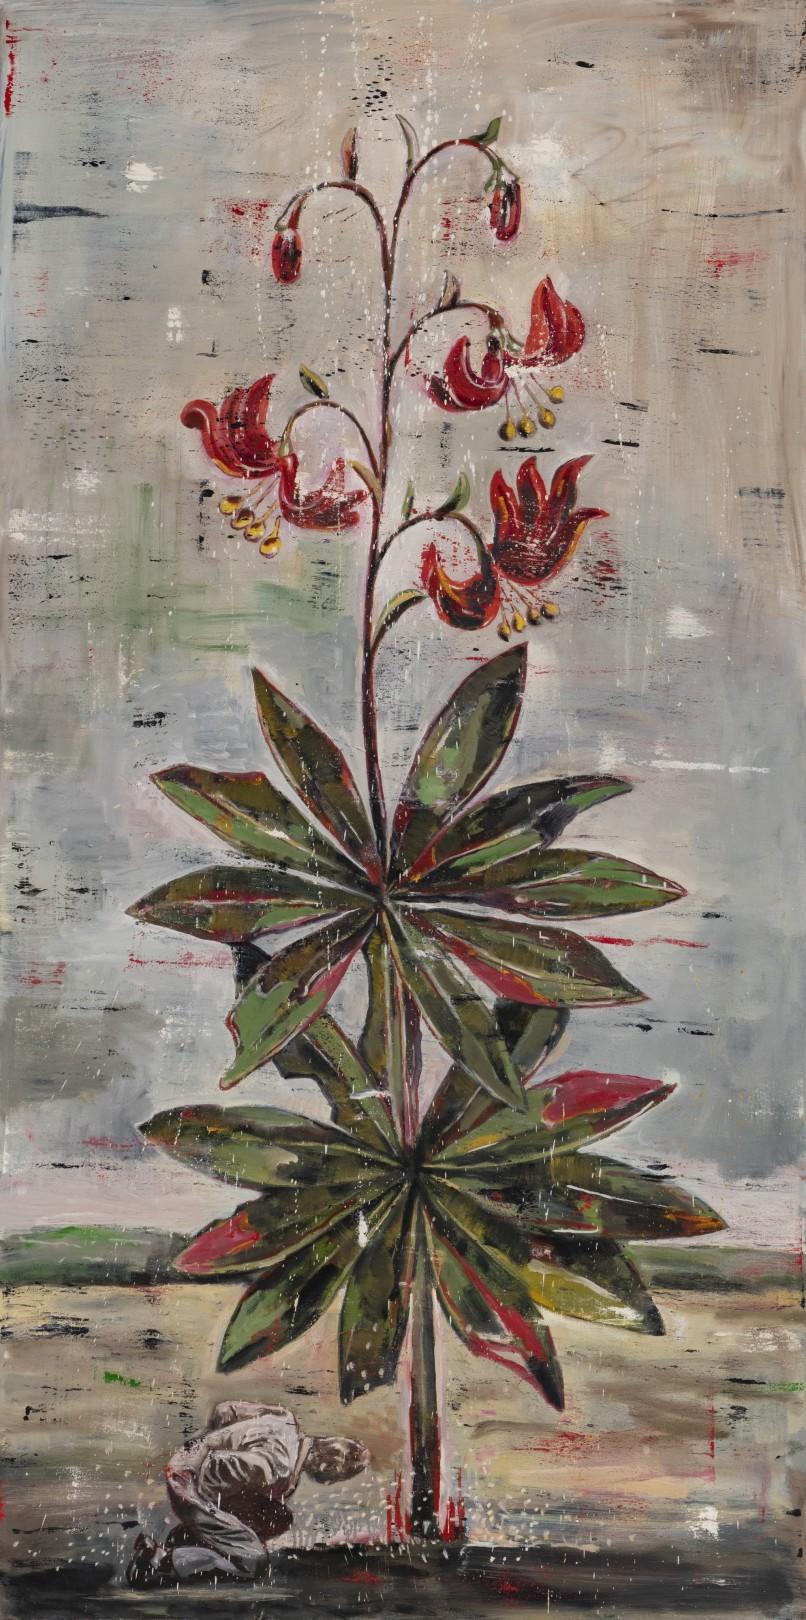 Nicky Nodjoumi Environmental Series - Martagon, 2018 Oil on canvas 183 x 91 cm. / 72 x 36 in.